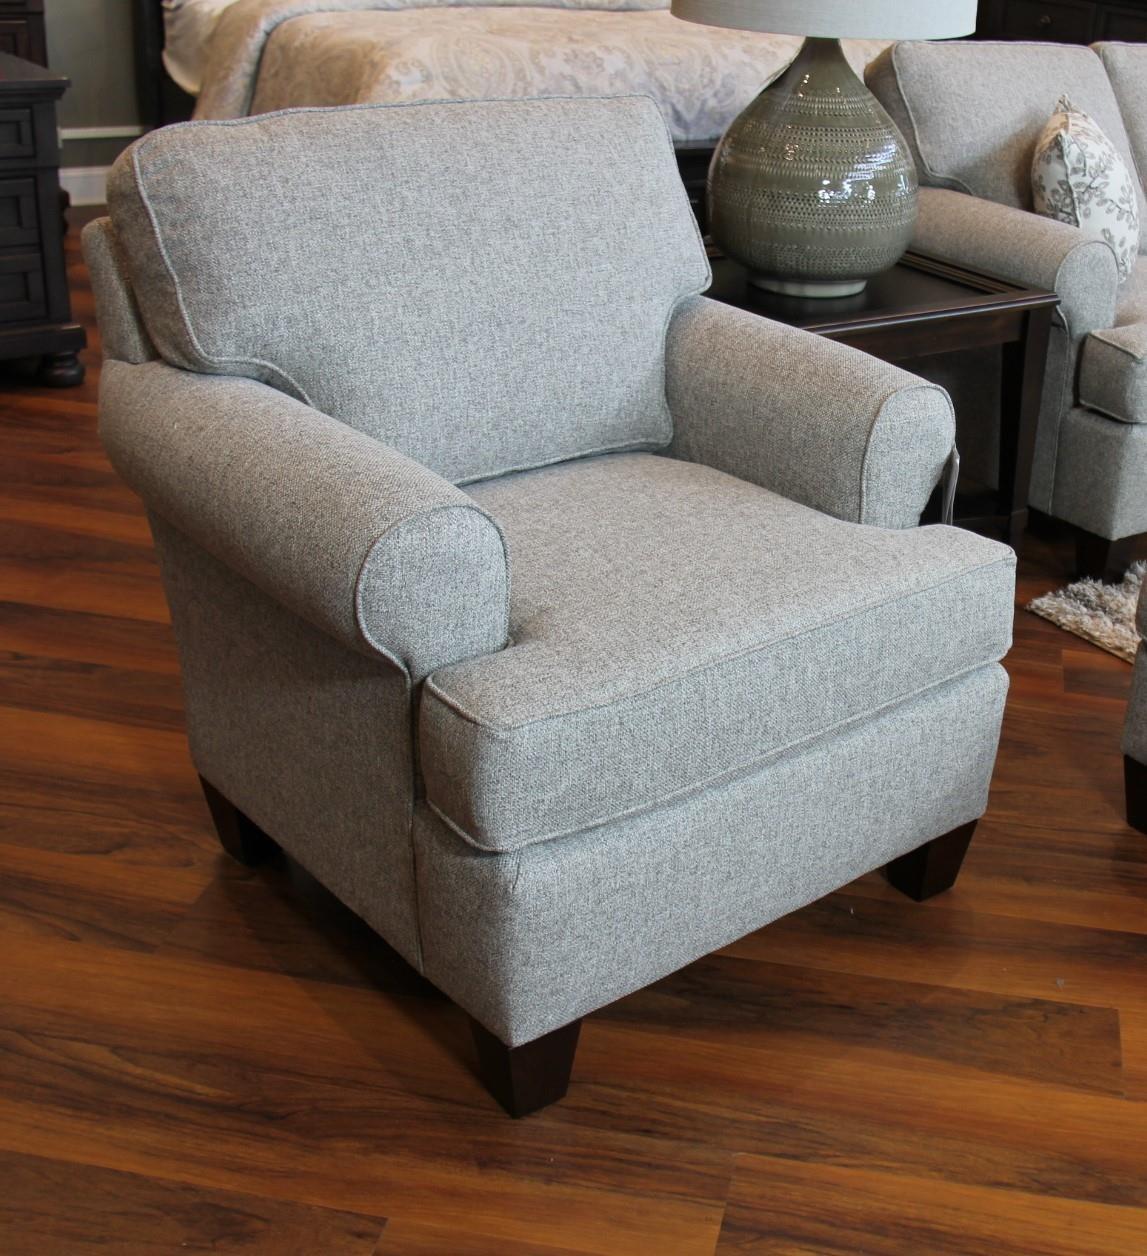 Brentwood Pepper Chair